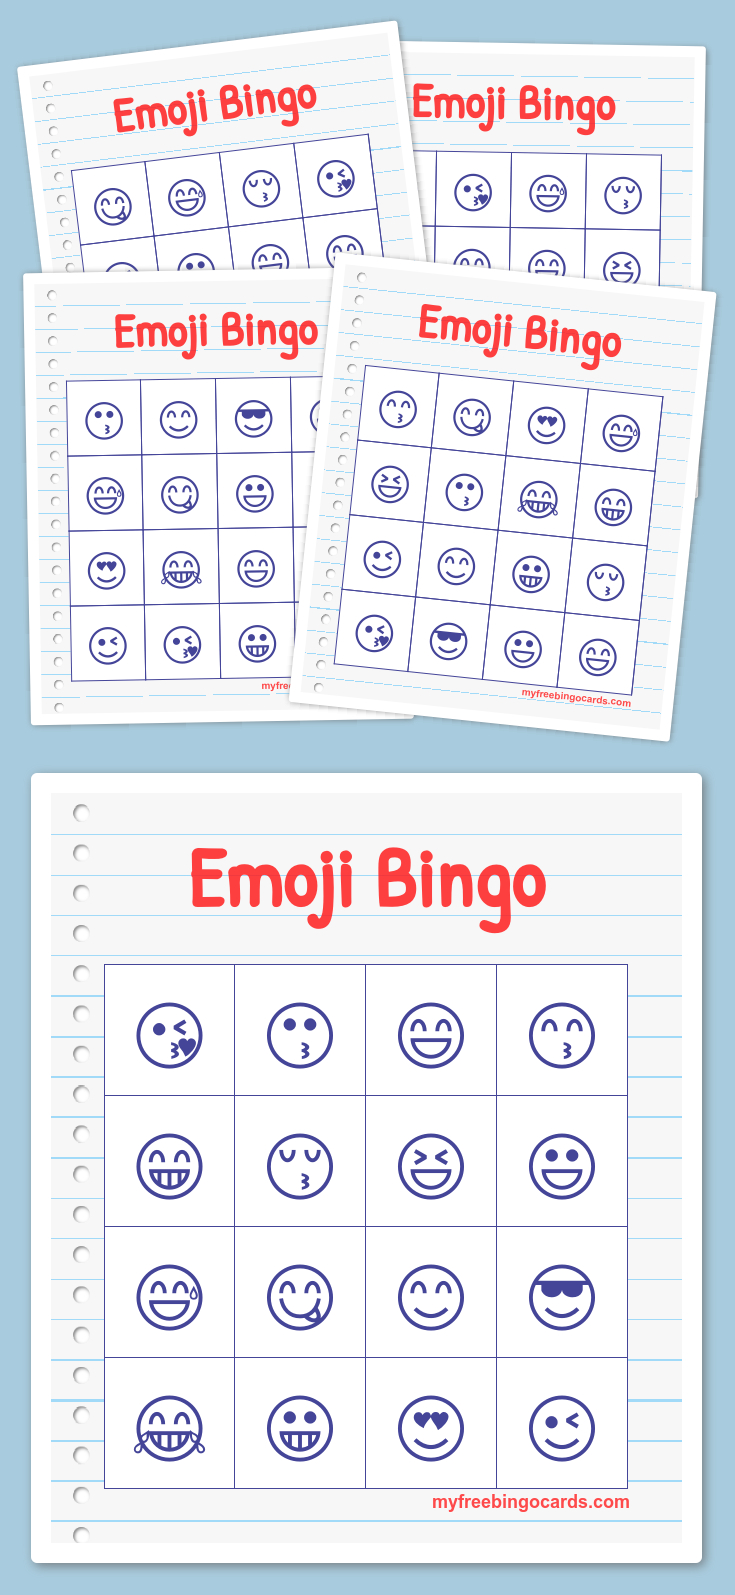 Free Printable Bingo Cards In 2019 | Londons Birthday | Emoji Bingo - Free Printable Bingo Cards Random Numbers